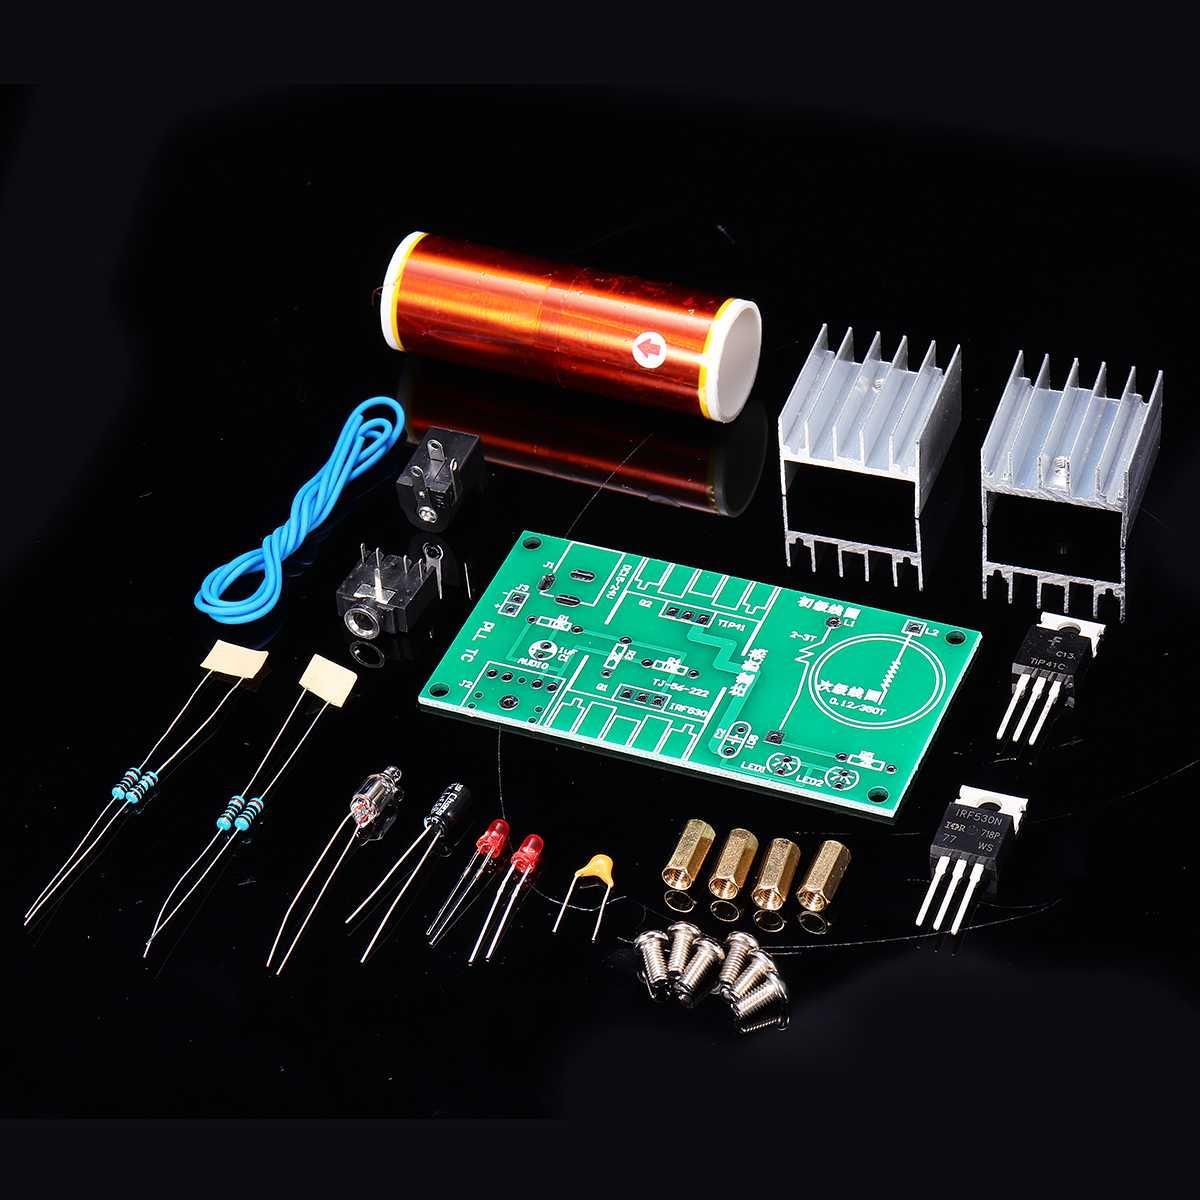 CLAITE 15W DC 15-24V 2A DIY Mini bobina módulo sin montar altavoz electrónico Kit resonante transformador altavoz